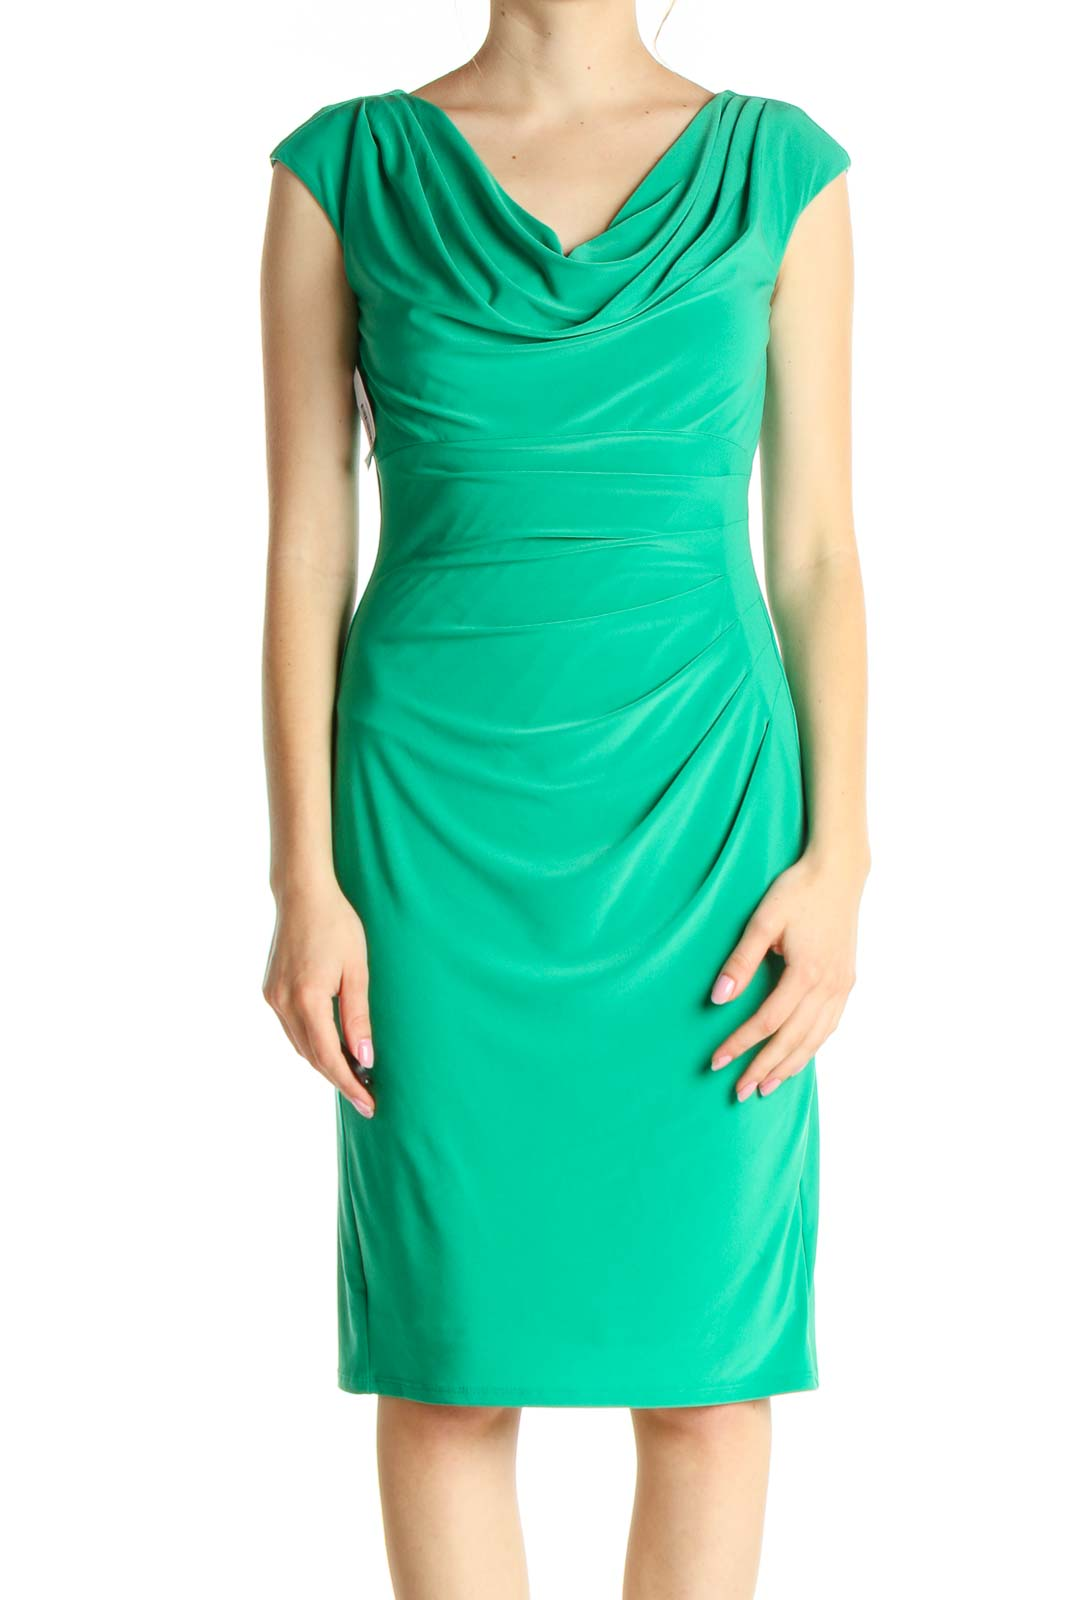 Green Solid Classic Sheath Dress Front